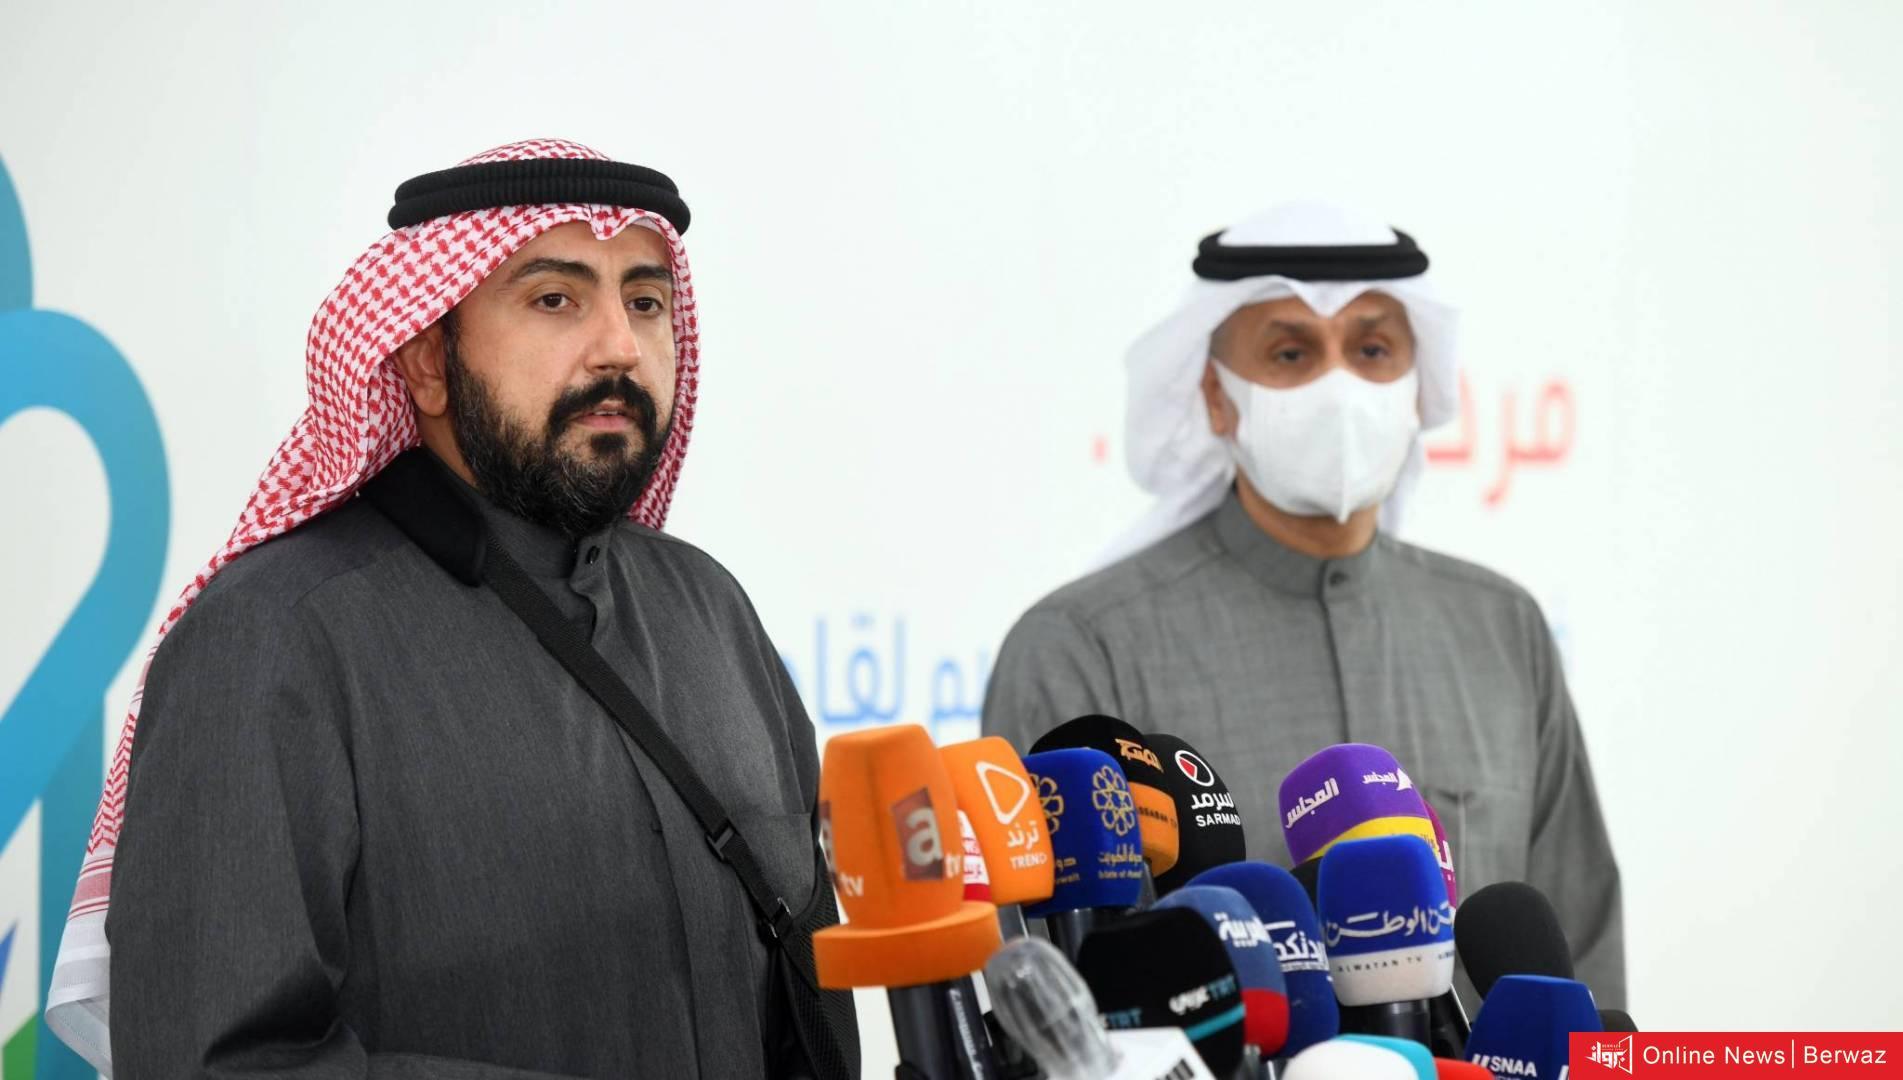 Ep t17nXIAEzGZA 820233 highres - باسل الصباح ينفي وجود سلالات جديدة لـ«كورونا» في الكويت